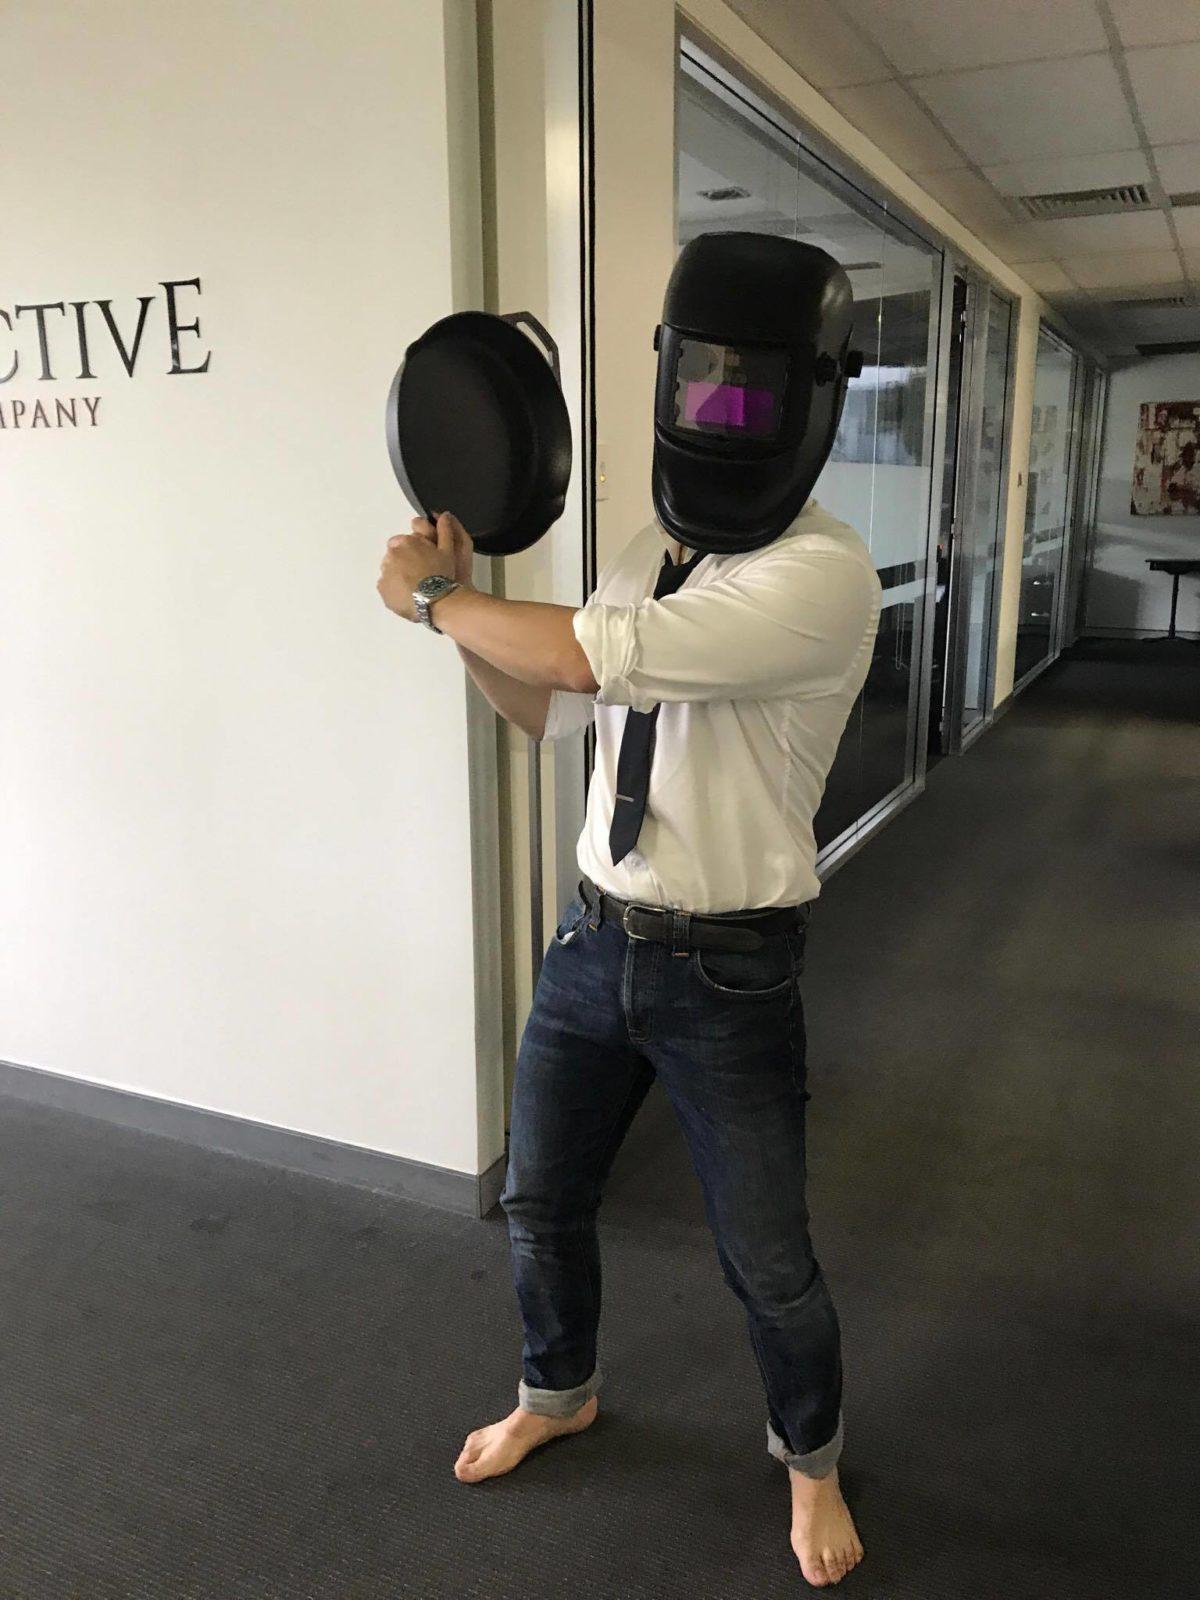 Barrel Fellatio: pick your shooting instructor carefully